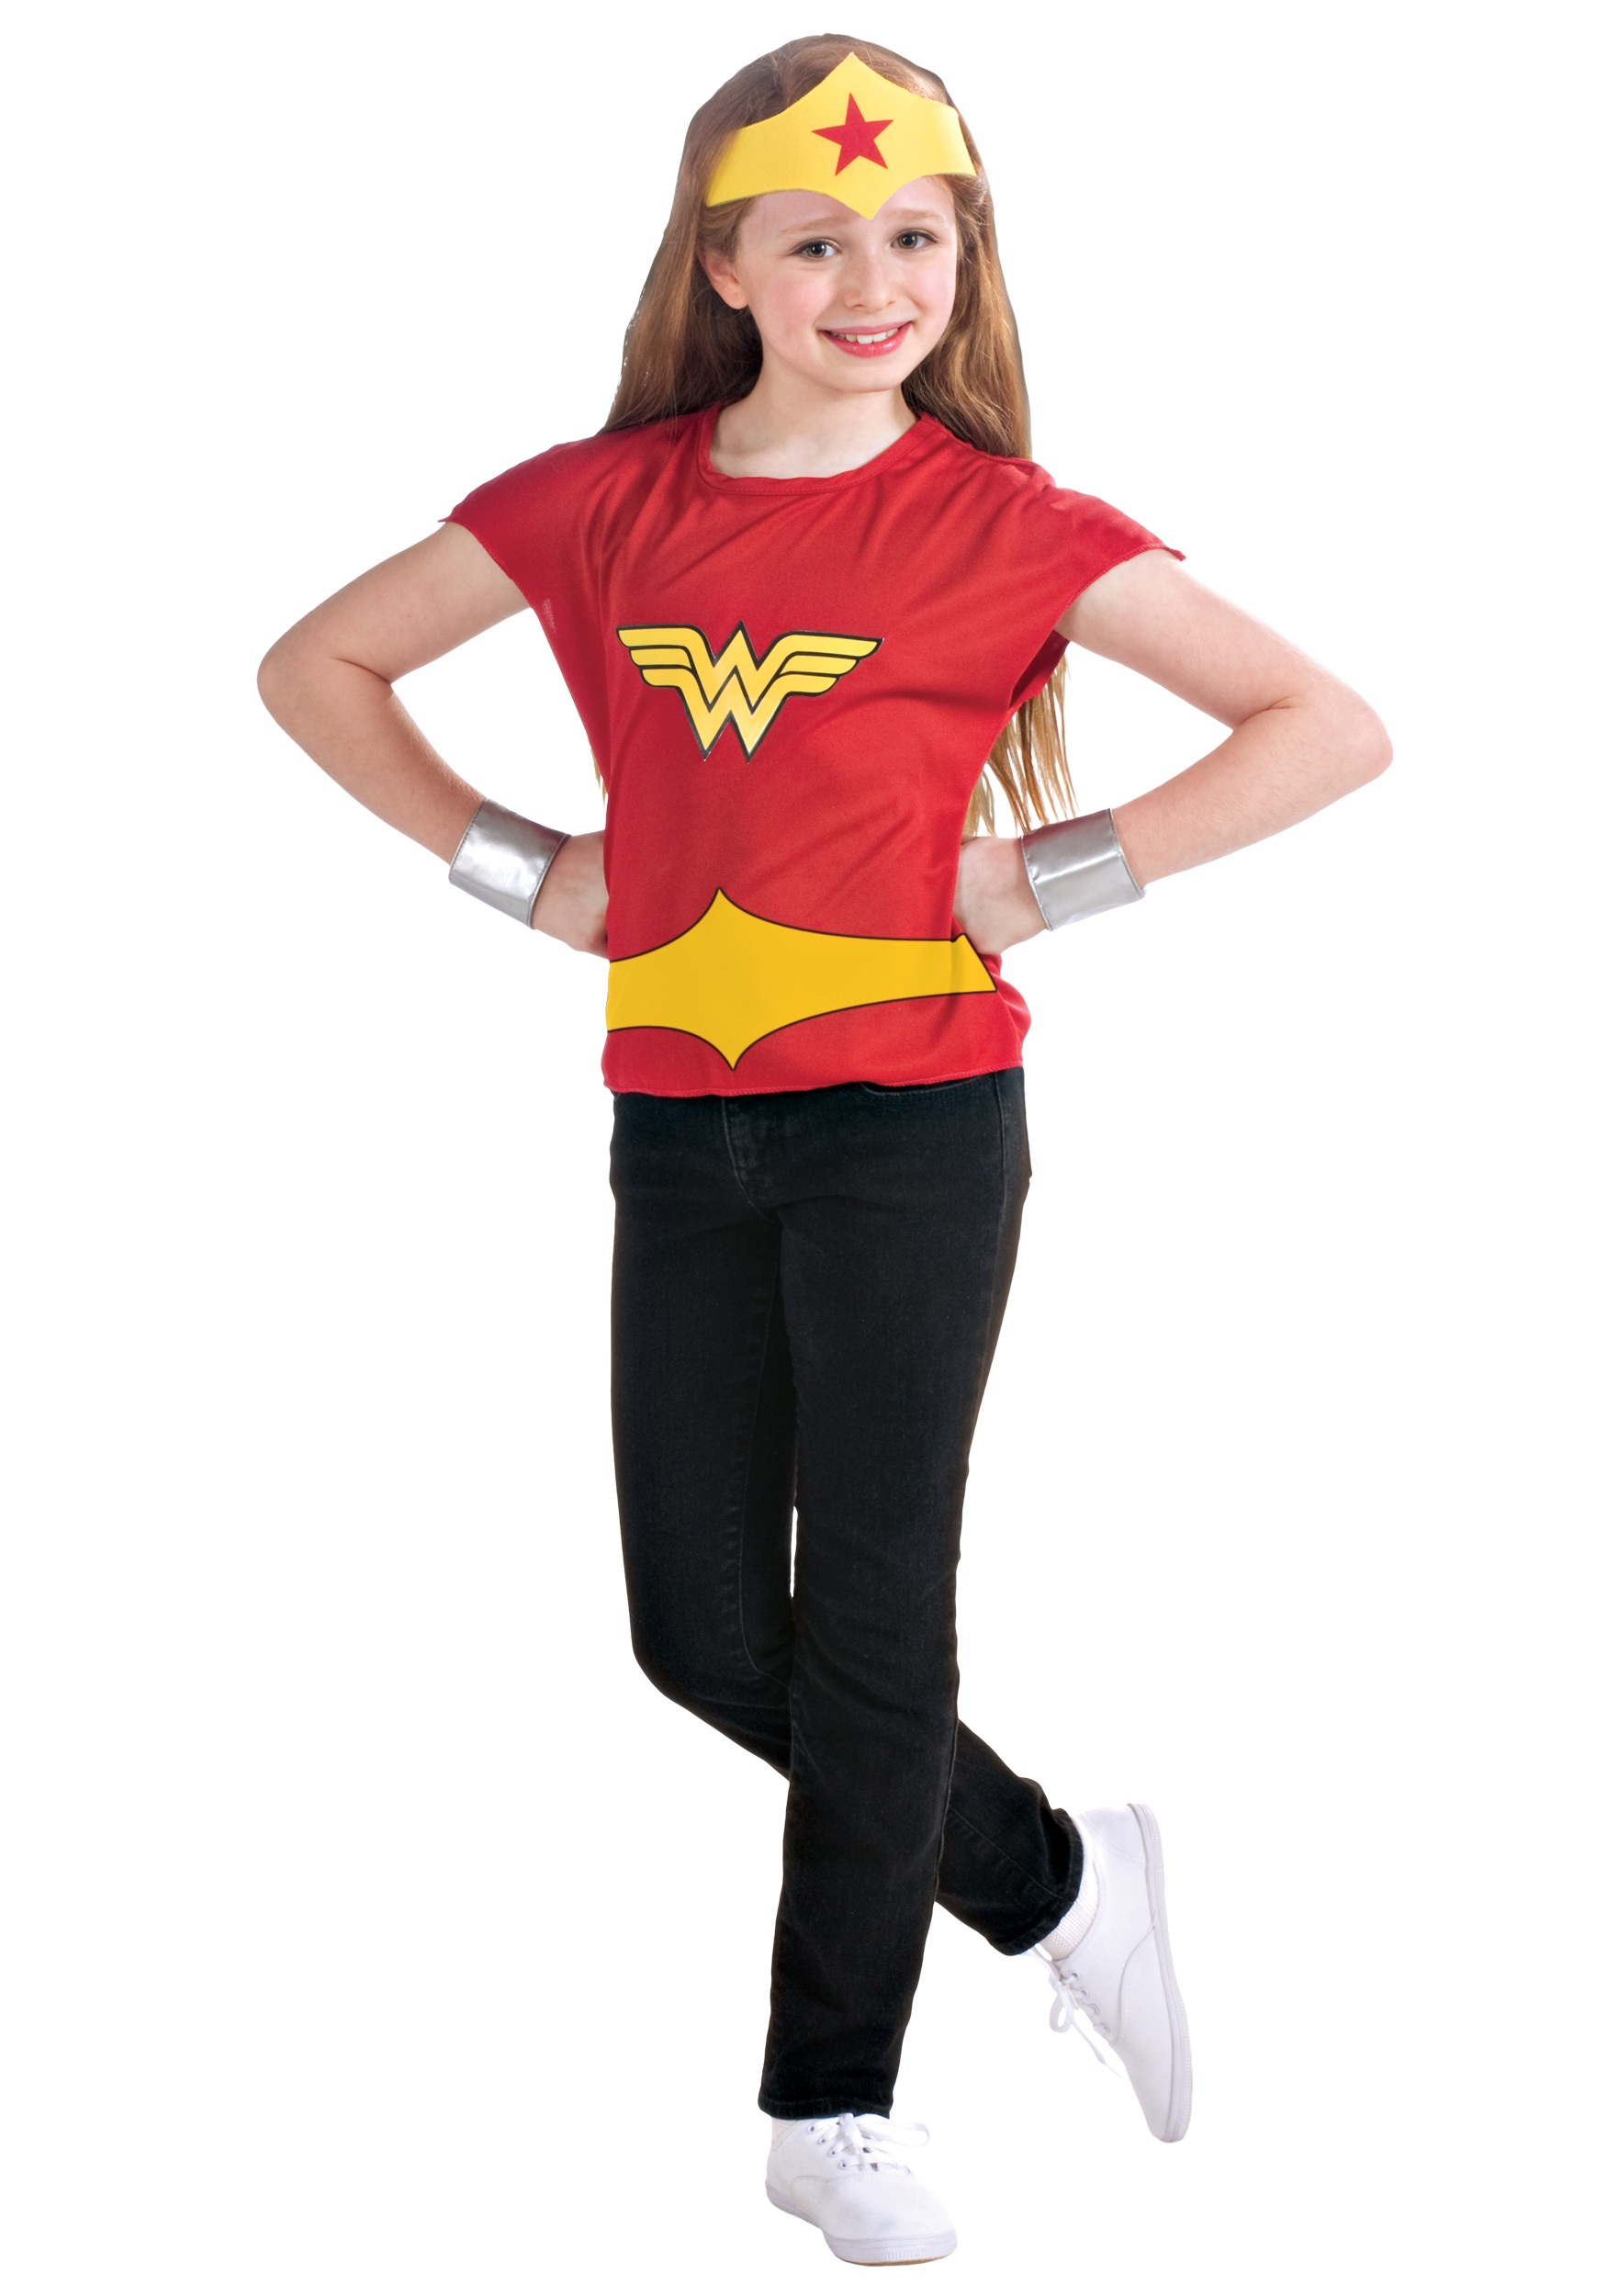 Wonder Woman Costume Set  sc 1 st  Halloween Costumes & Wonder Woman Costume Set - Halloween Costumes